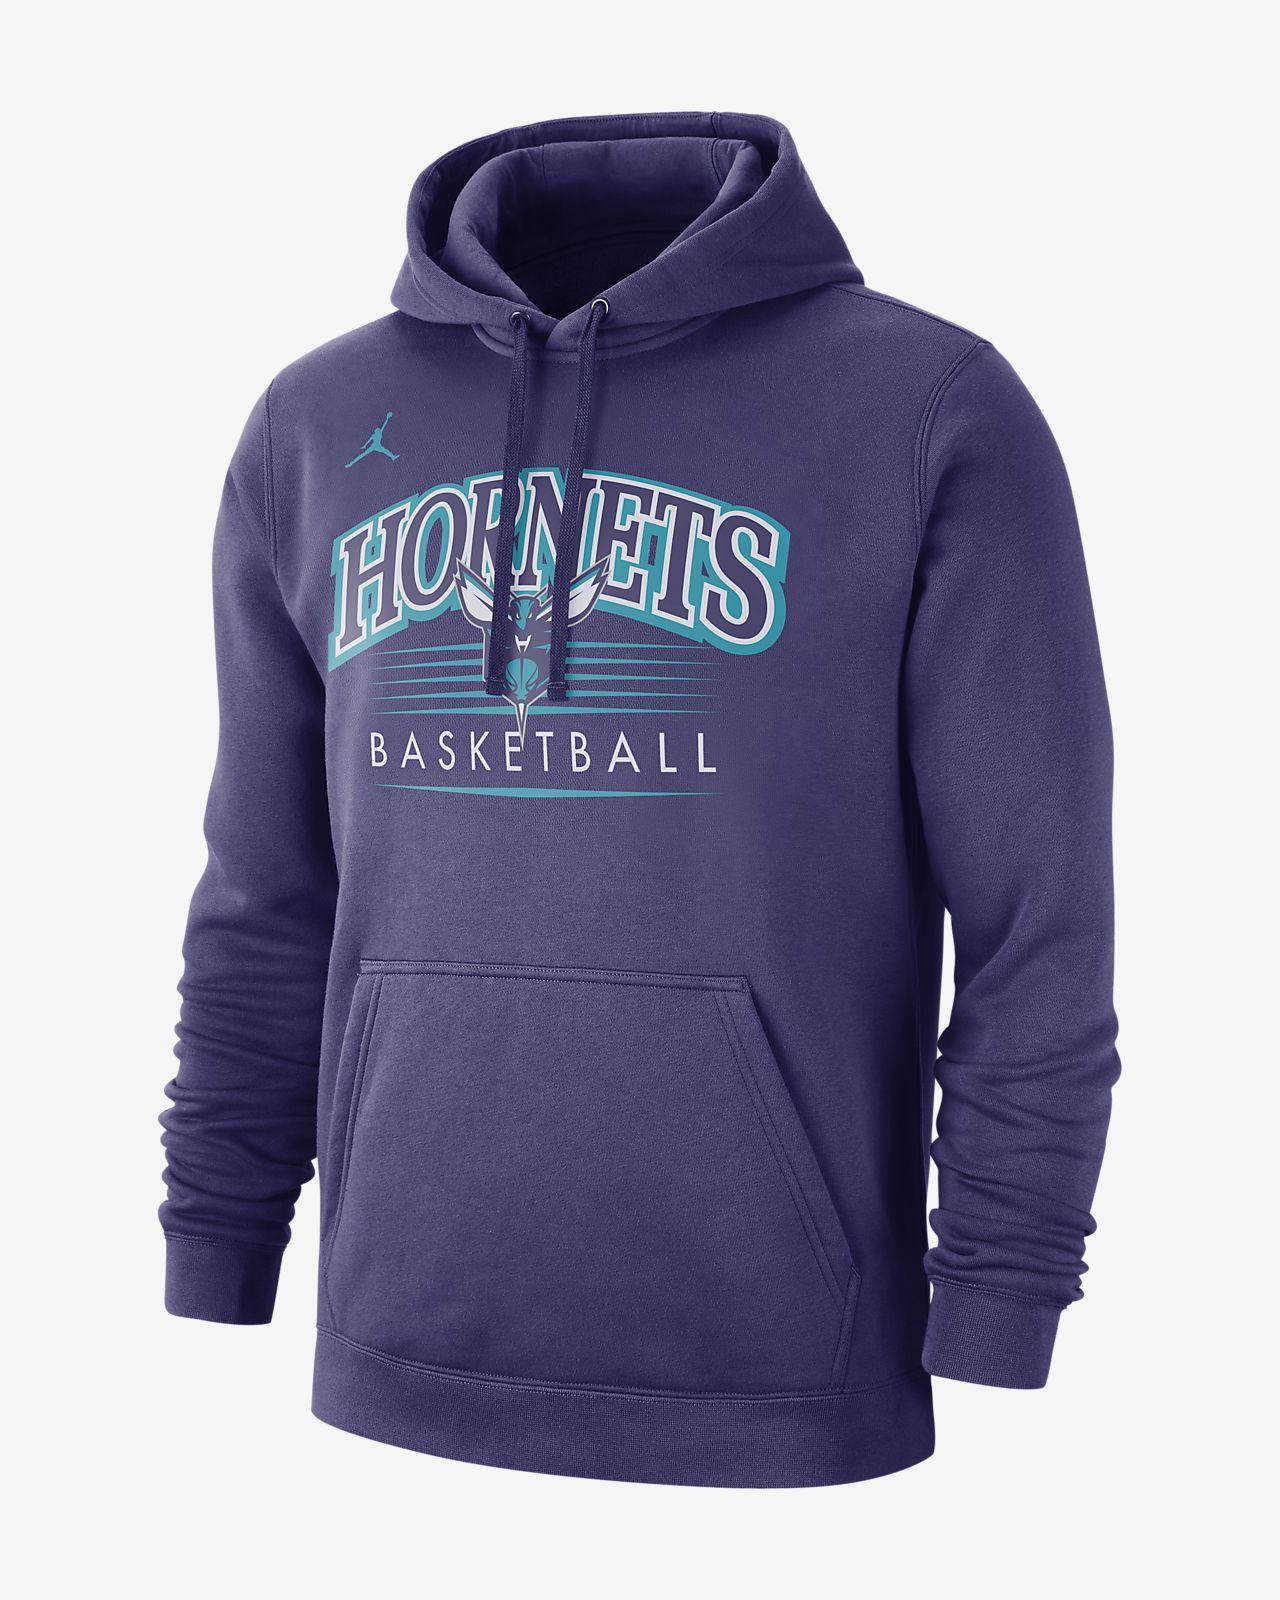 Charlotte Hornets Jordan Men's NBA Hoodie